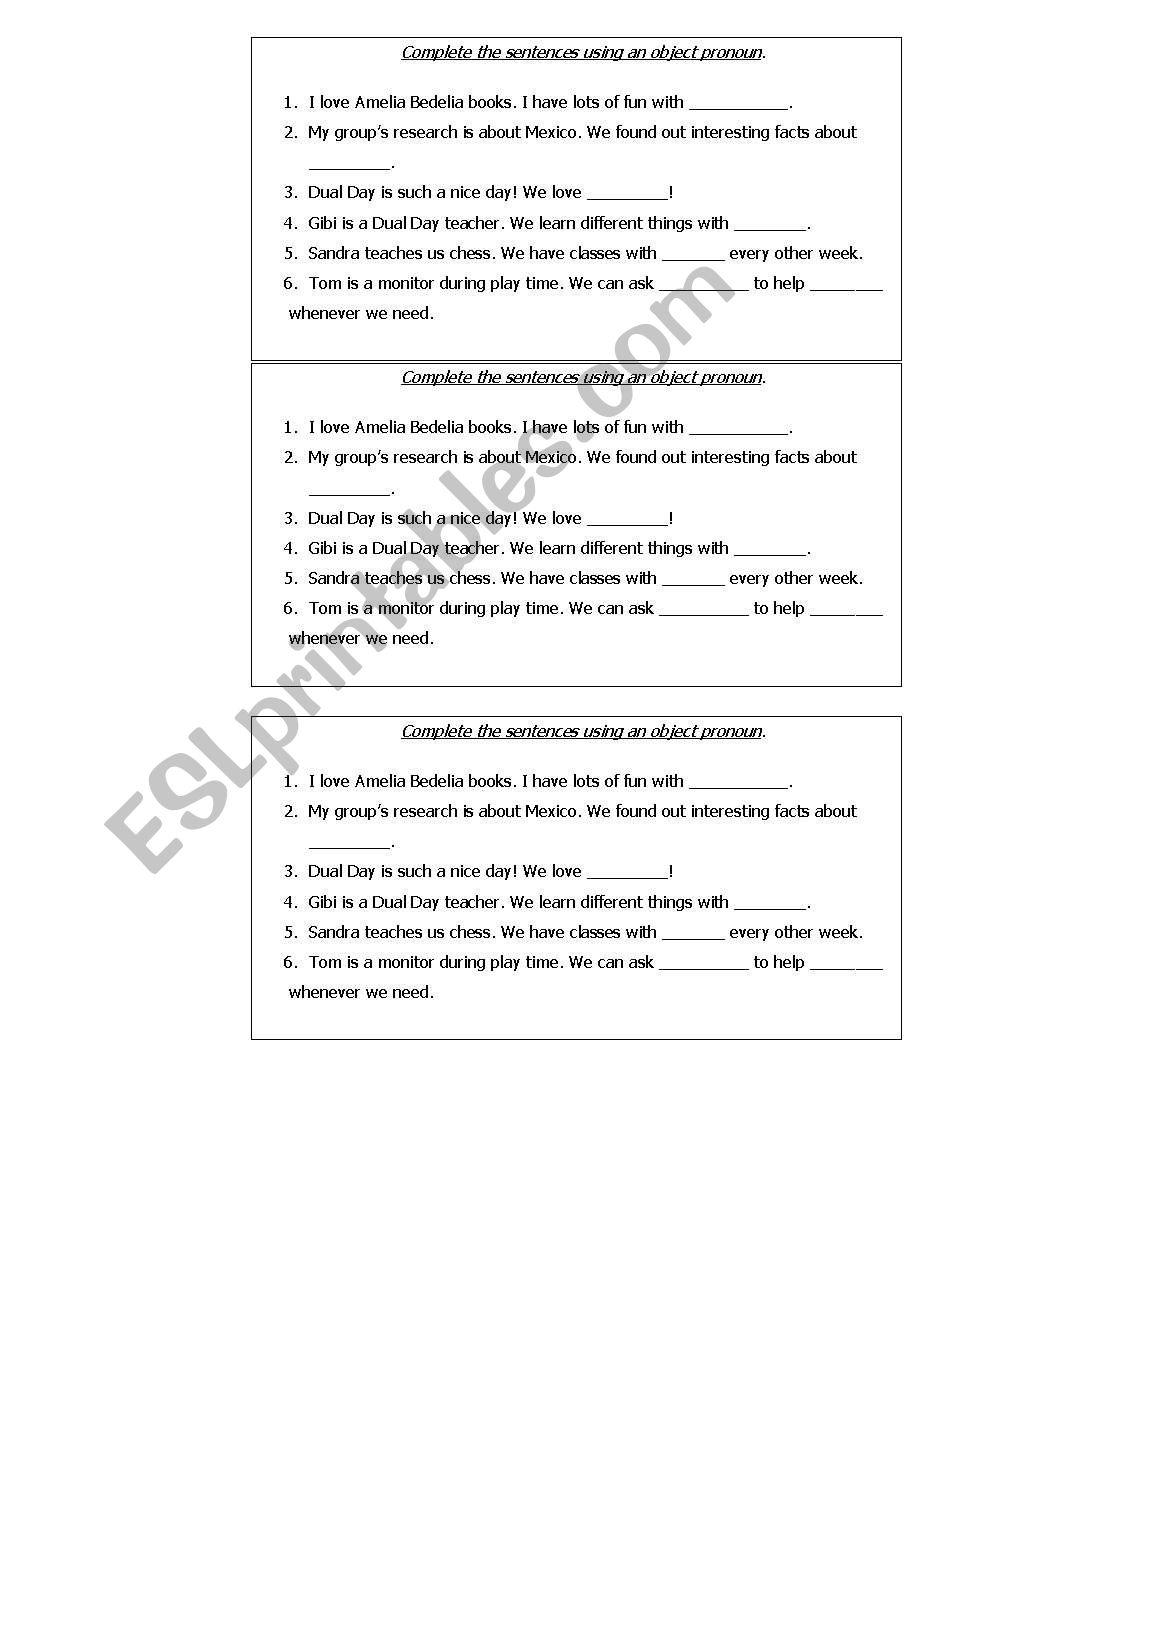 English Worksheets Object Pronoun